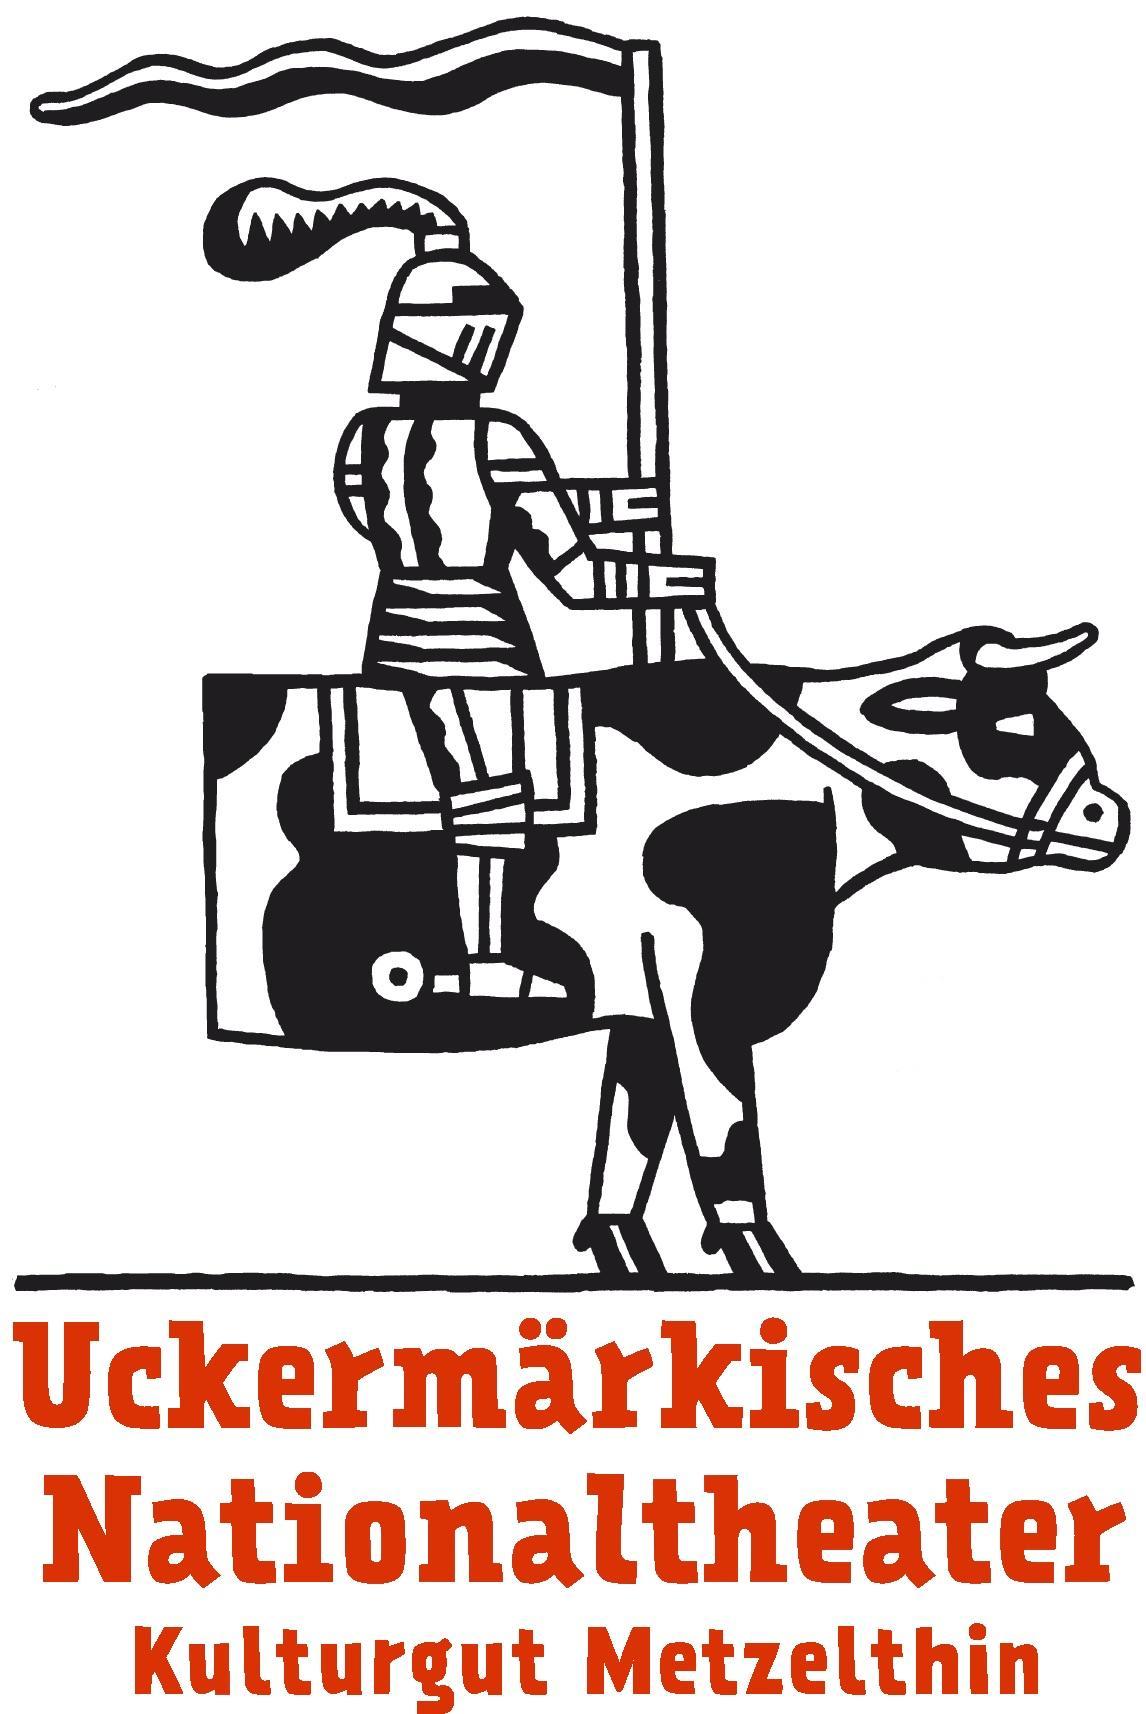 Halbe Kuh Logo